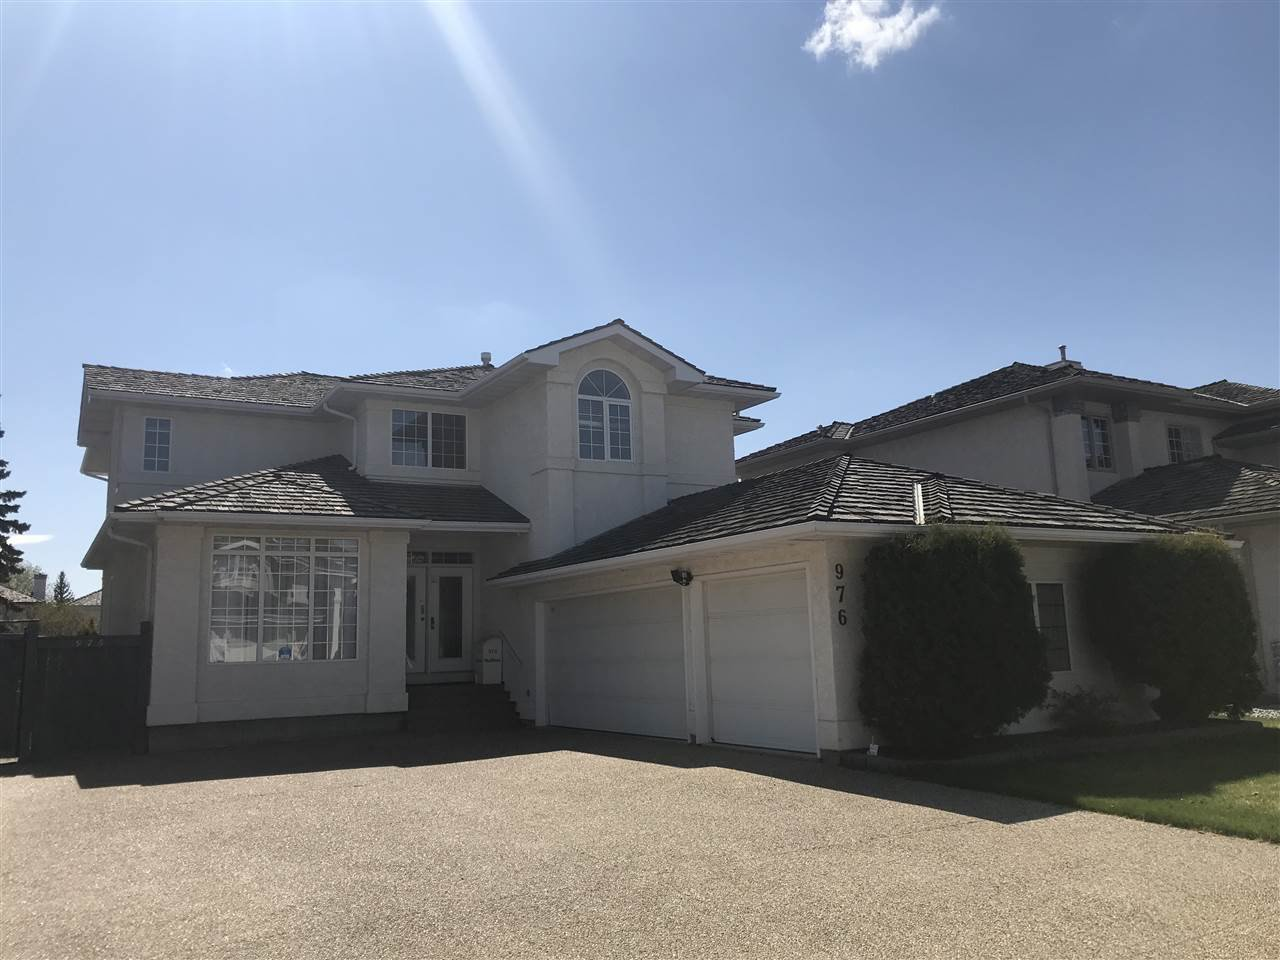 Main Photo: 976 Wallbridge Place NW in Edmonton: Zone 22 House for sale : MLS®# E4197060